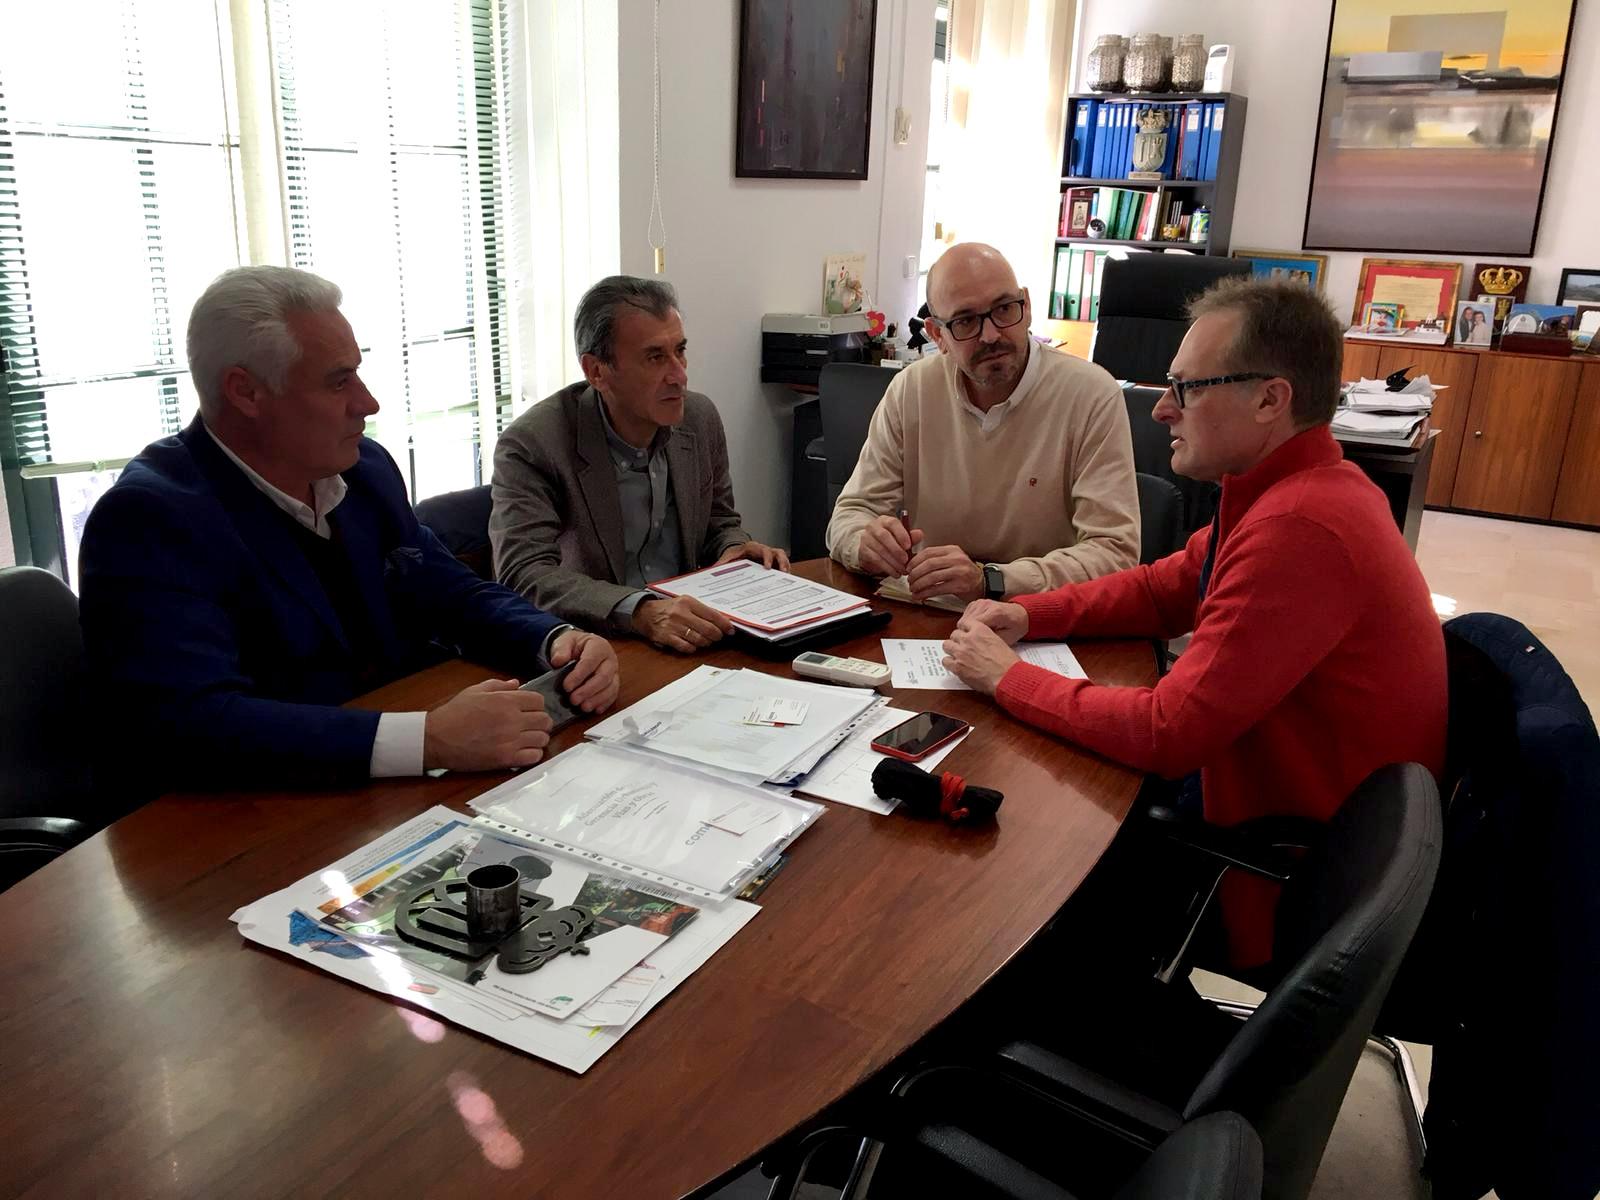 reunion-alcaldes-cartama-jorge-gallardo-y-alora-jose-sanchez-con-renfe-050219-5